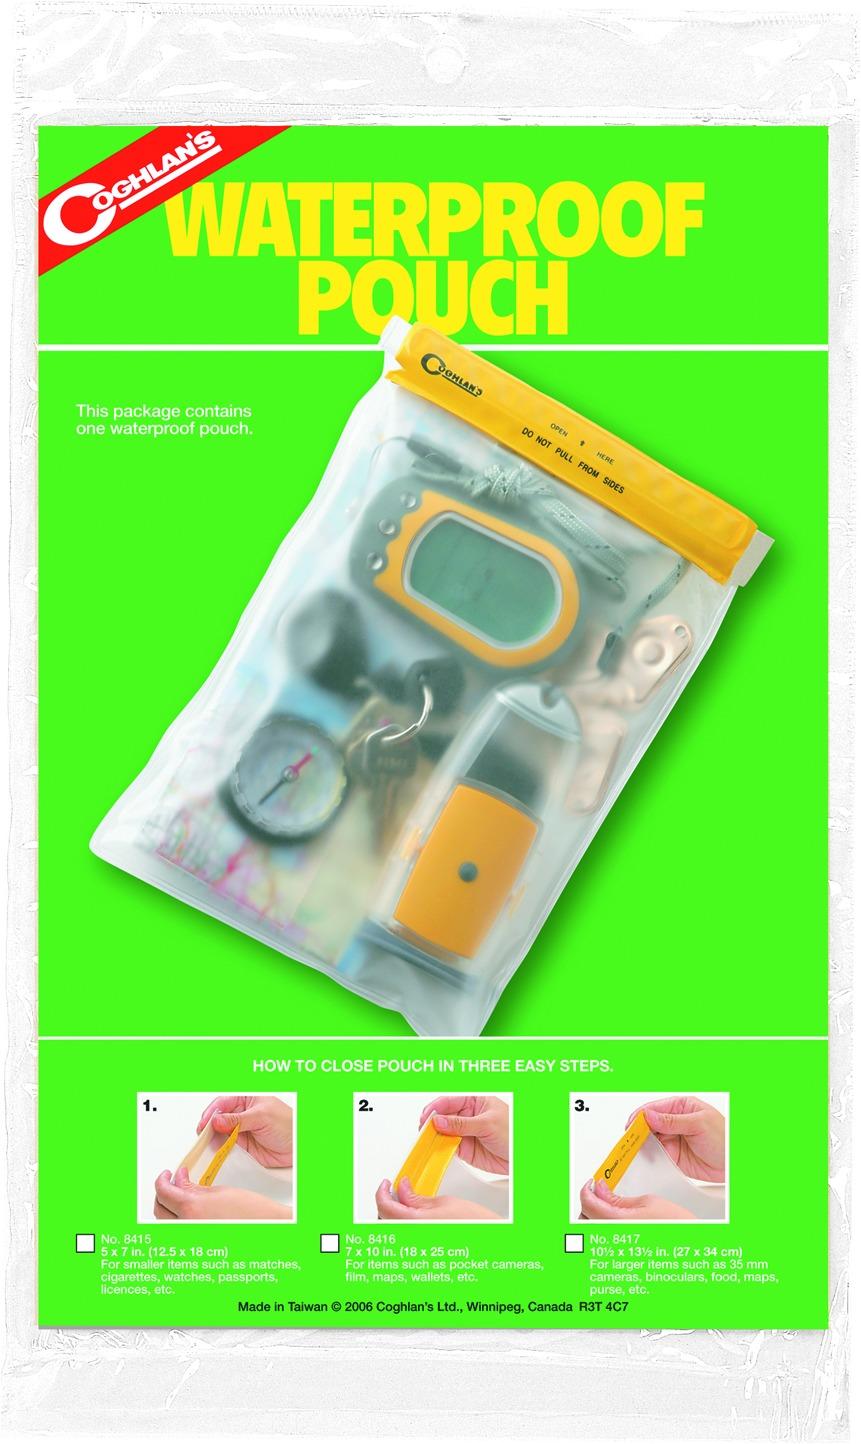 Coghlans 8415 Waterproof Pouch 5